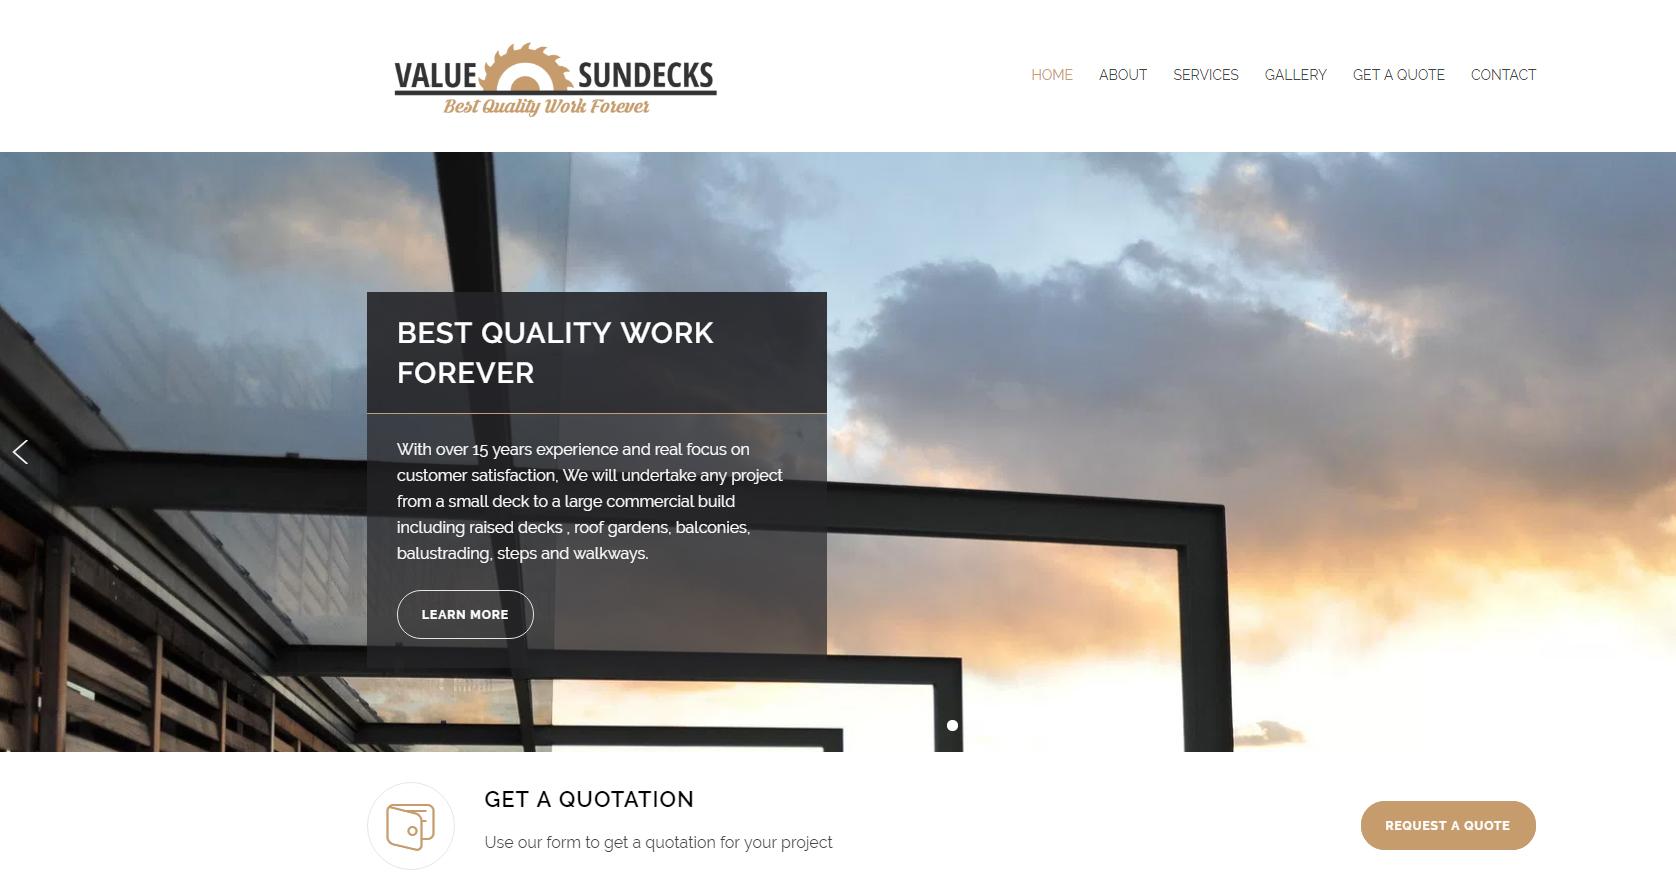 Value Sundecks